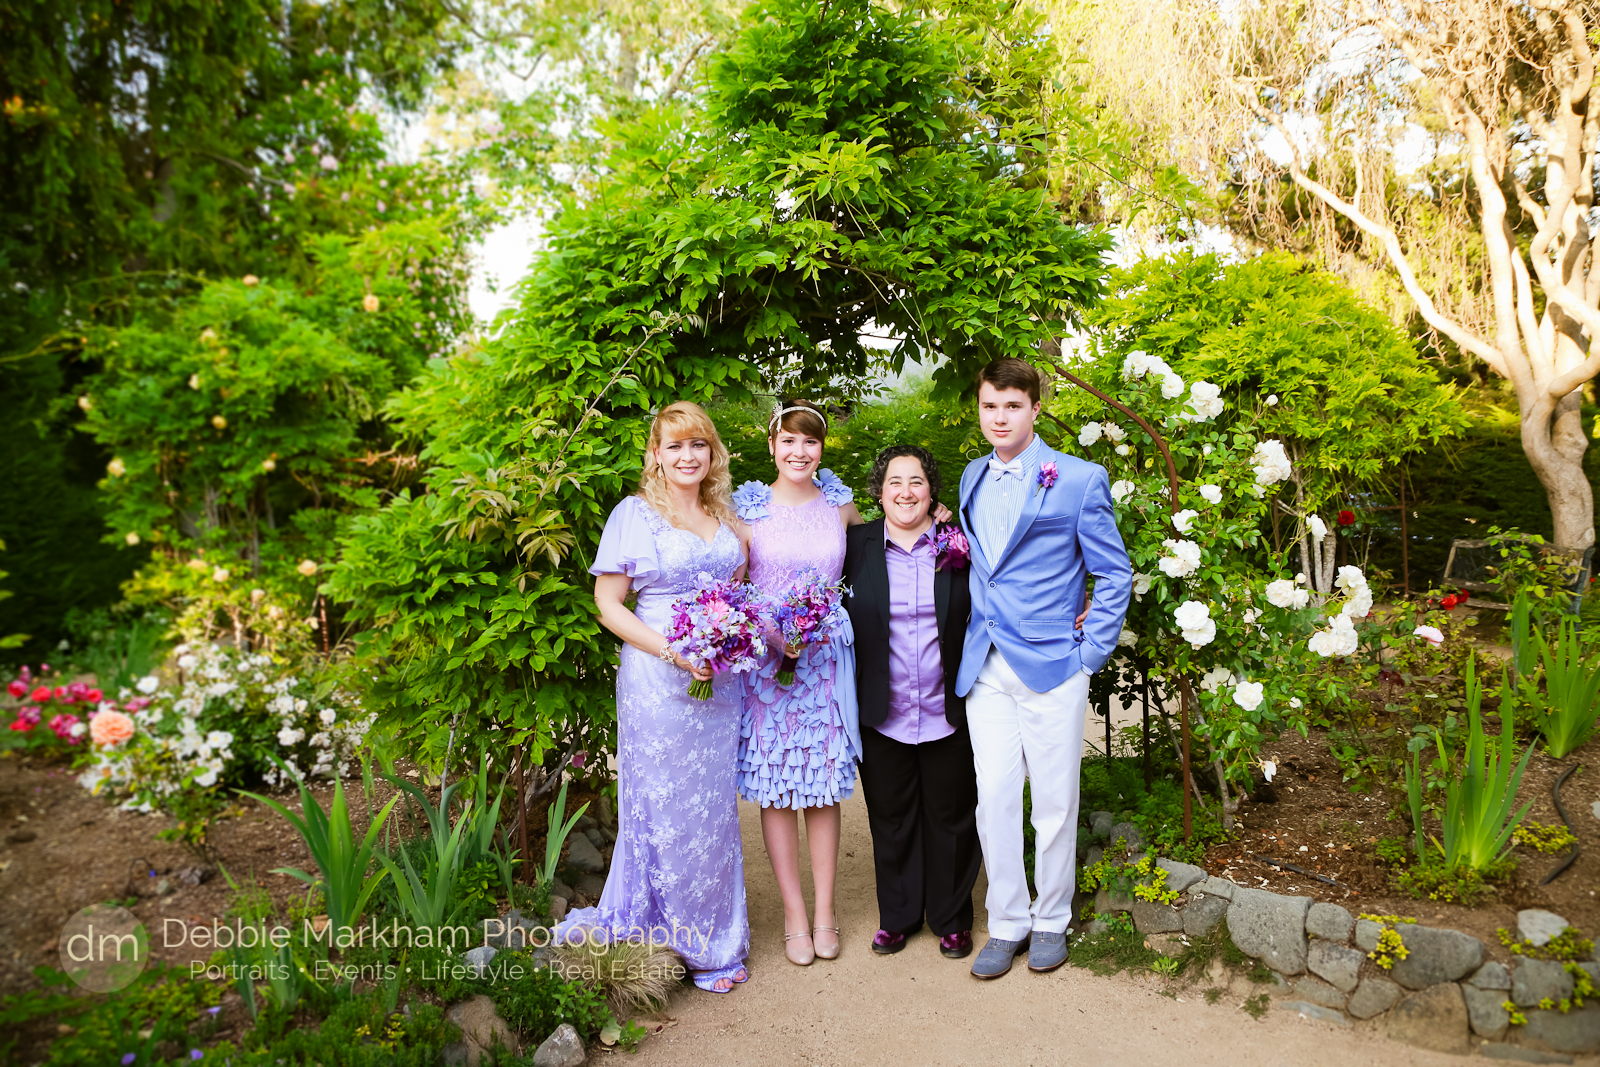 Debbie Markham Photography_Wedding Photographer_Cambria Pines Lodge_Same Sex Wedding_LGBT_Destination Wedding-0639